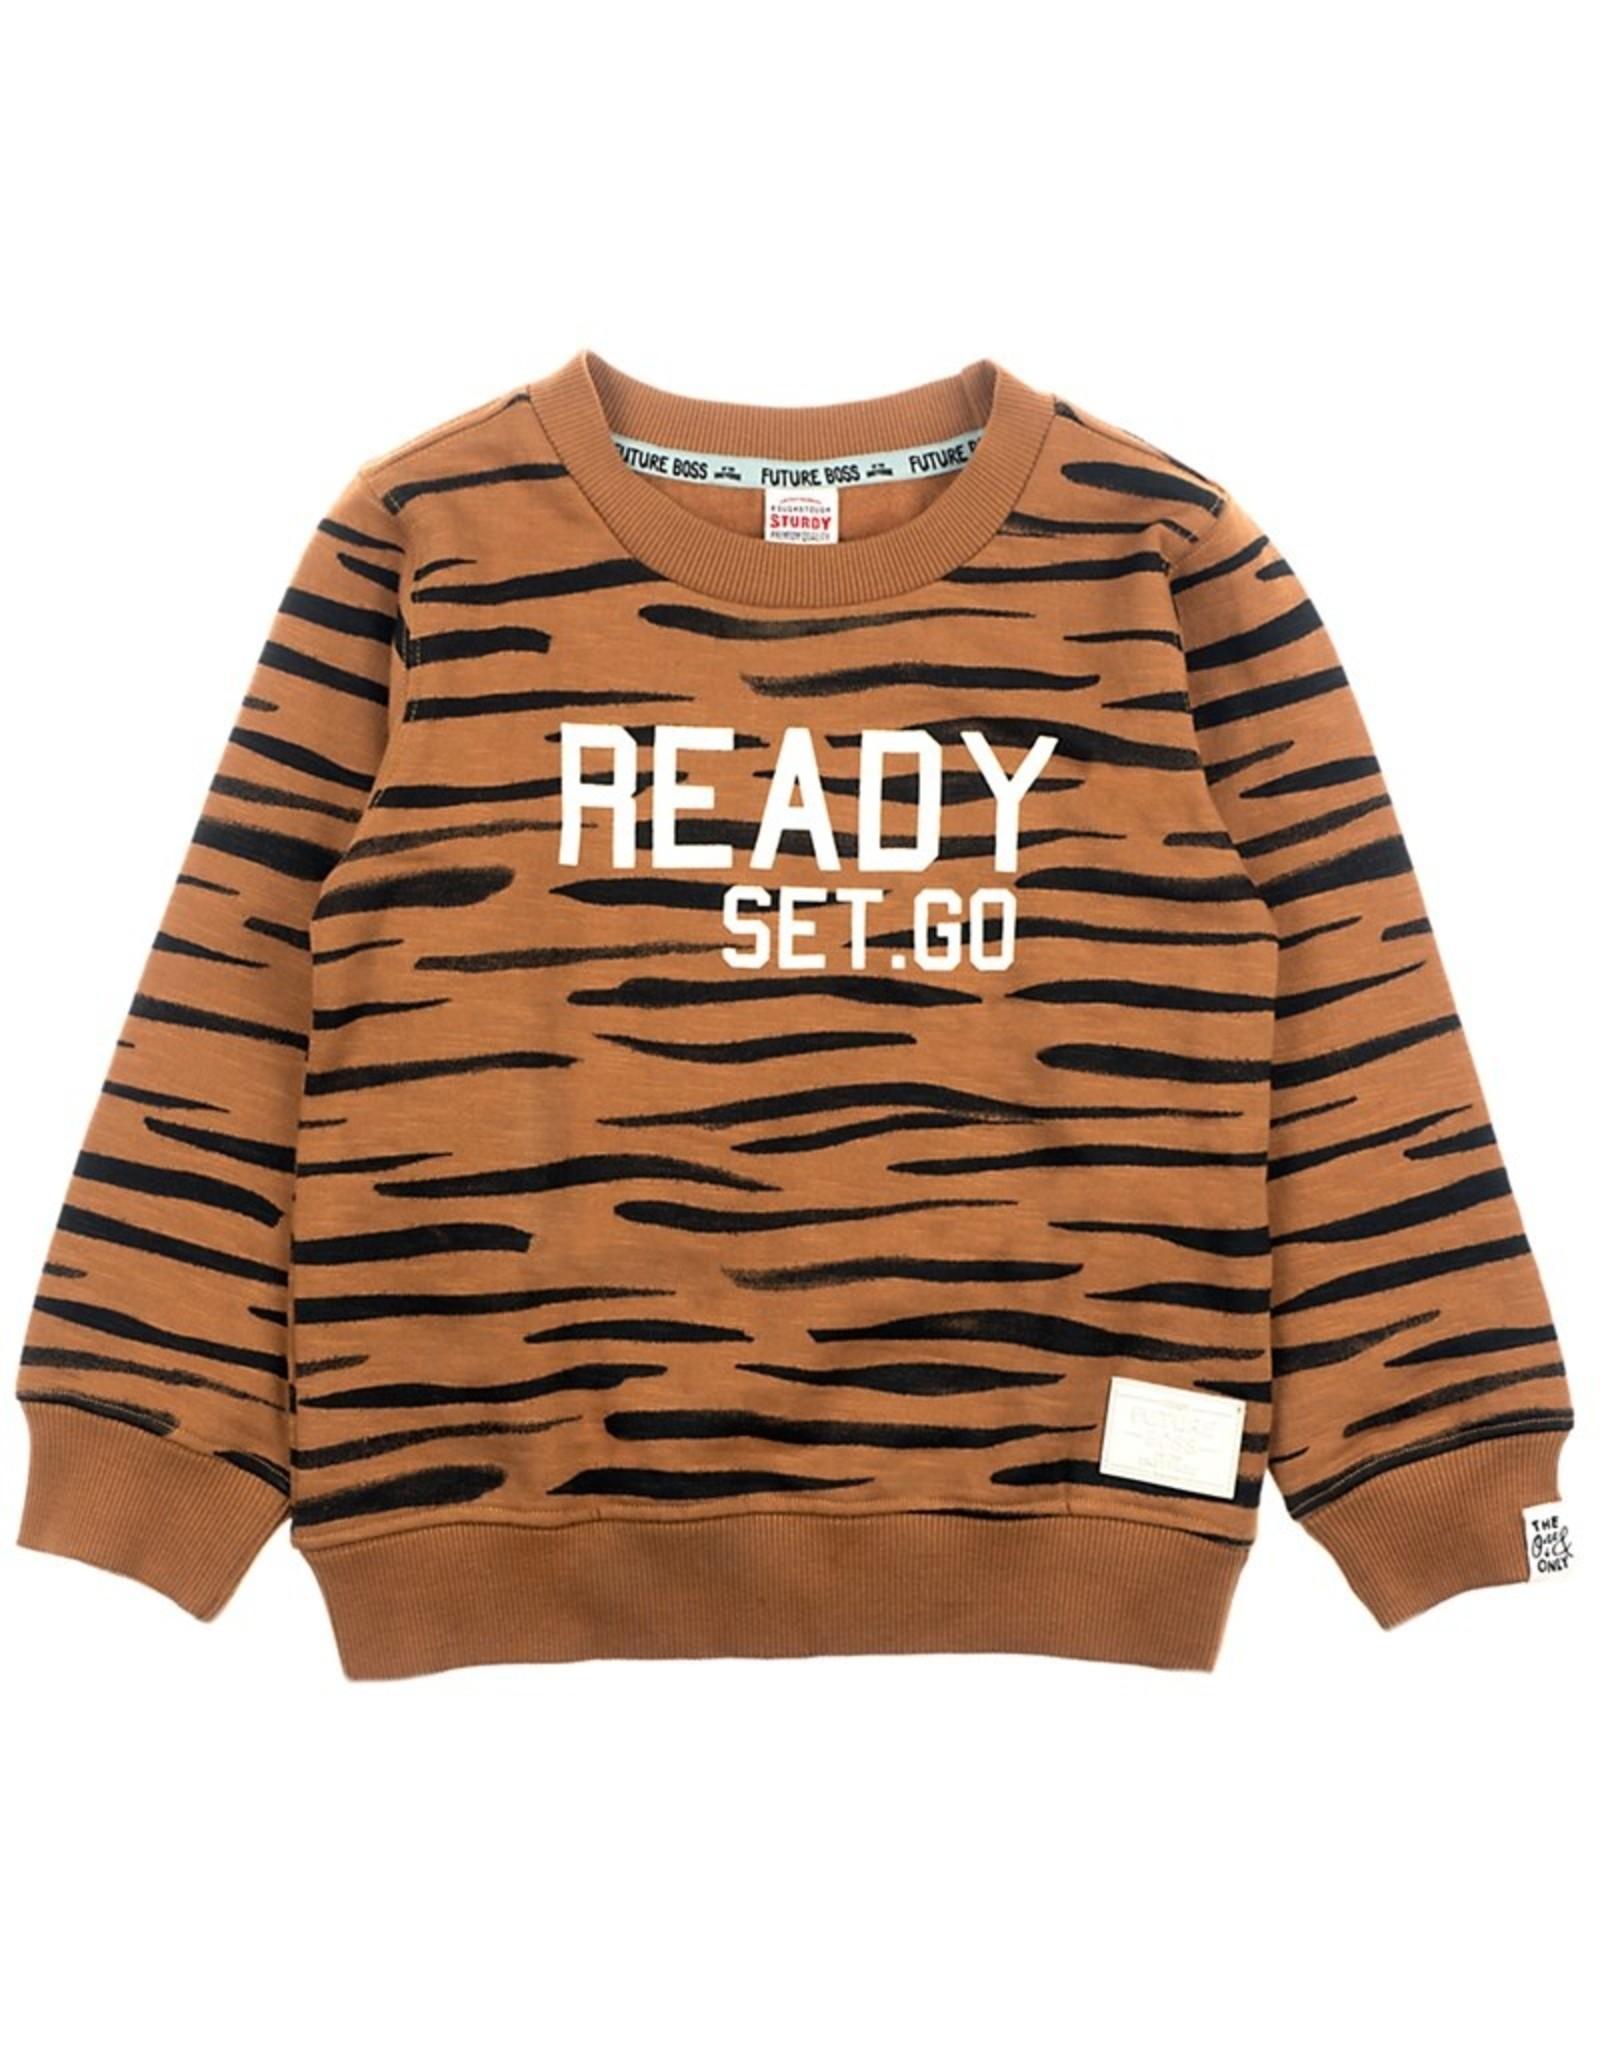 Sturdy Sturdy bruine trui met 'Ready Set Go' opdruk